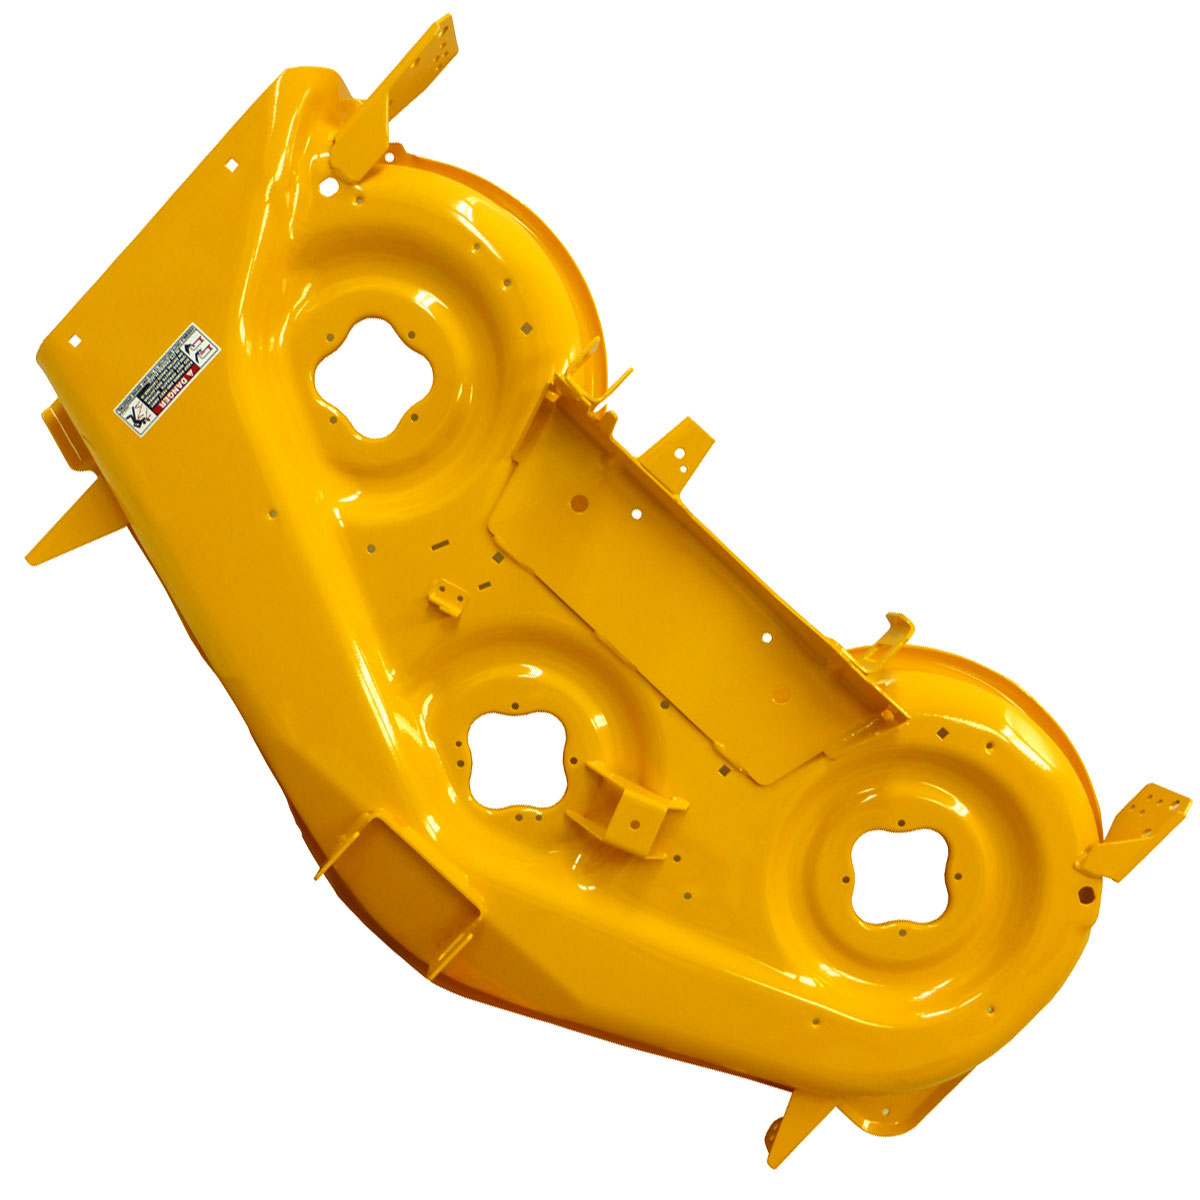 Cub Cadet Rzt 50 Inch Yellow Deck Shell 903 04328c 0716